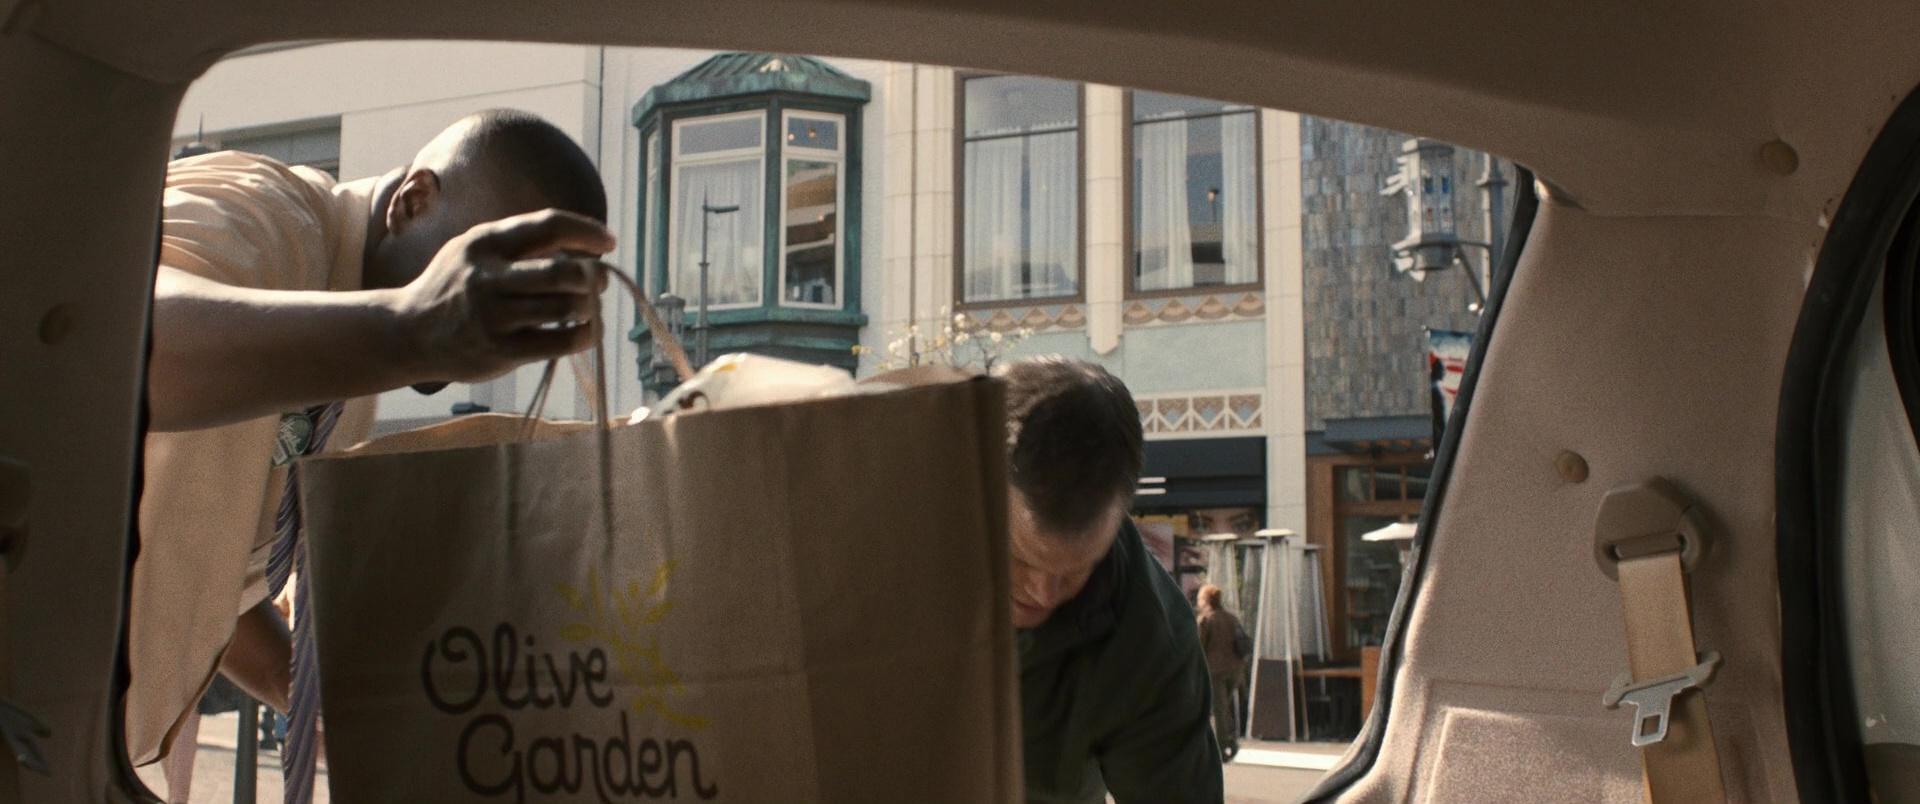 Olive Garden Restaurant Paper Bags Used by Matt Damon in Downsizing ...